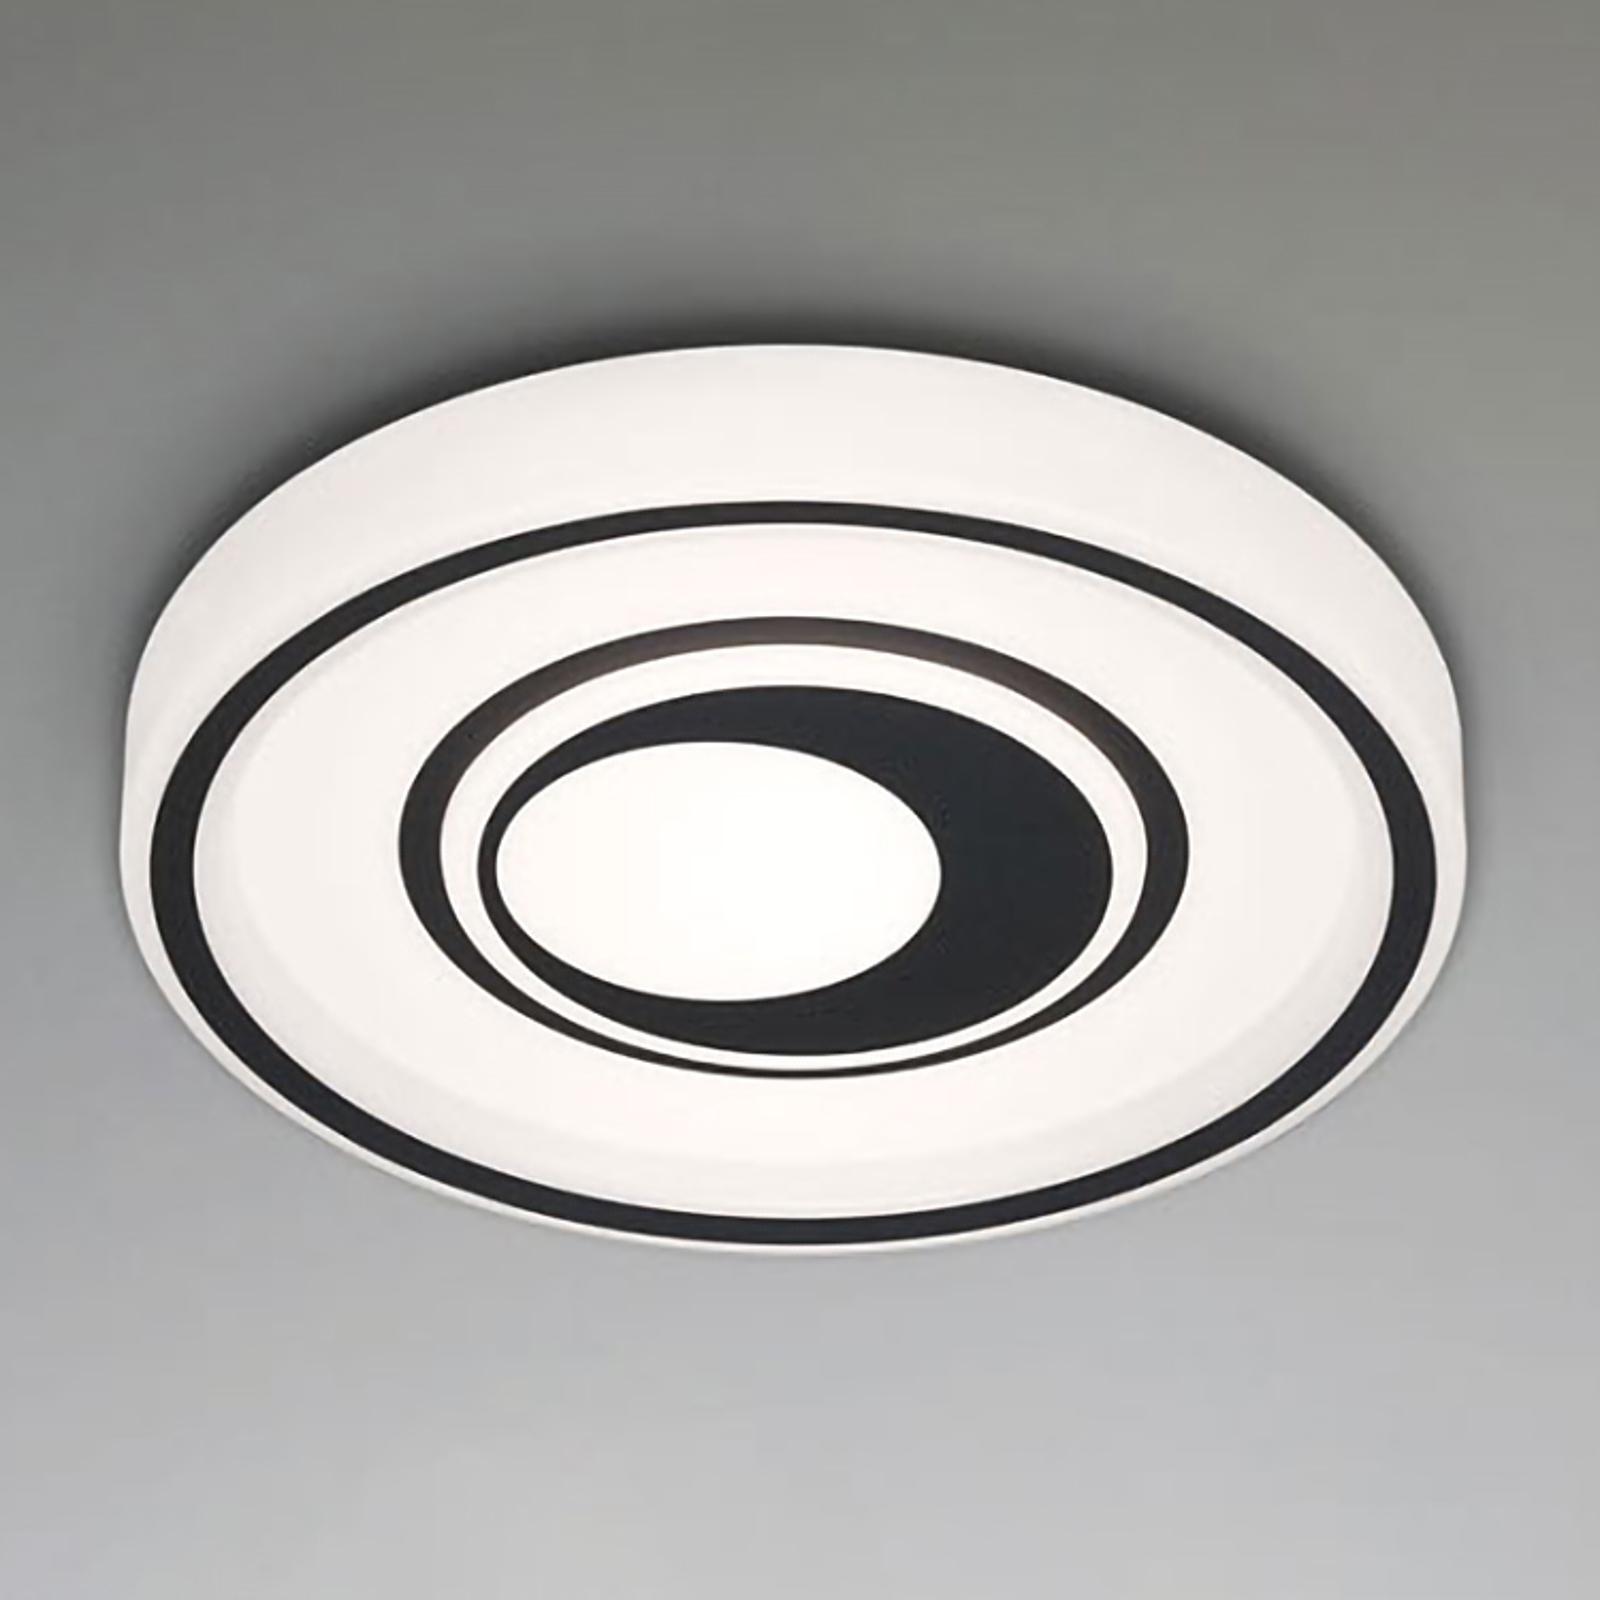 LED-taklampe Rondo L, fjernkontroll, svart